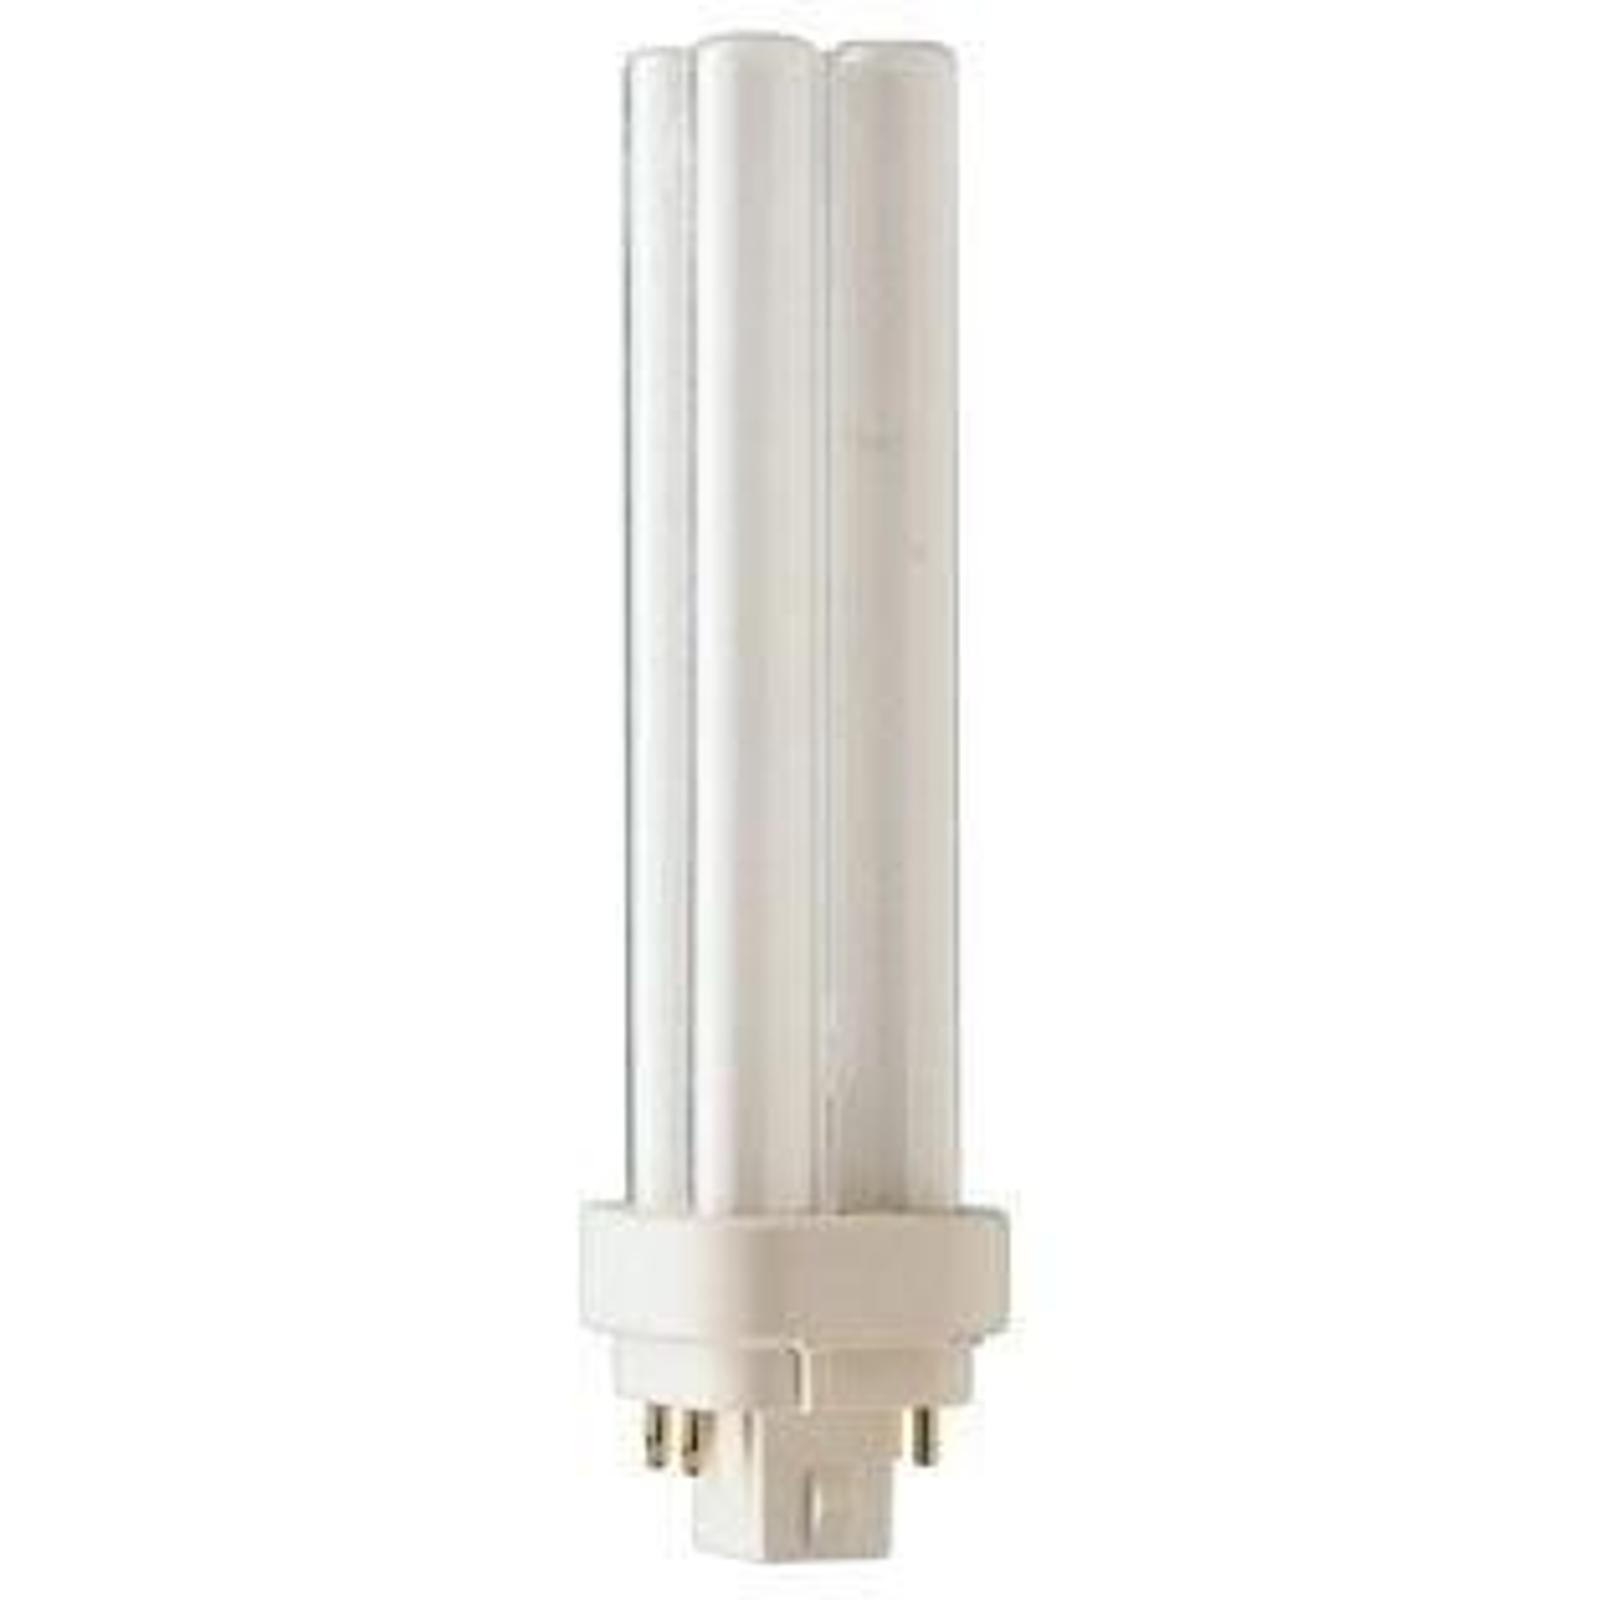 G24q 13W 827 Kompaktleuchtstofflampe DULUX D/E